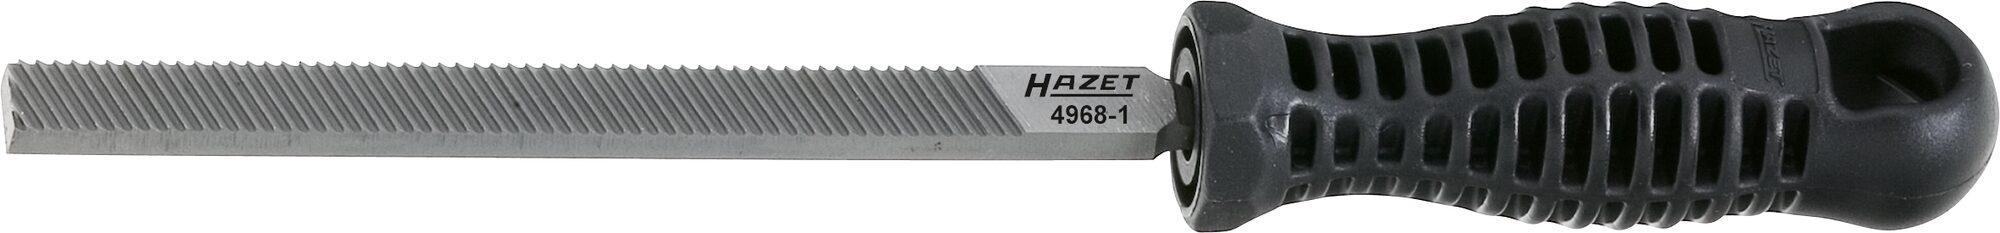 HAZET Bremssattel-Feile 4968-1 ∙ 260 mm